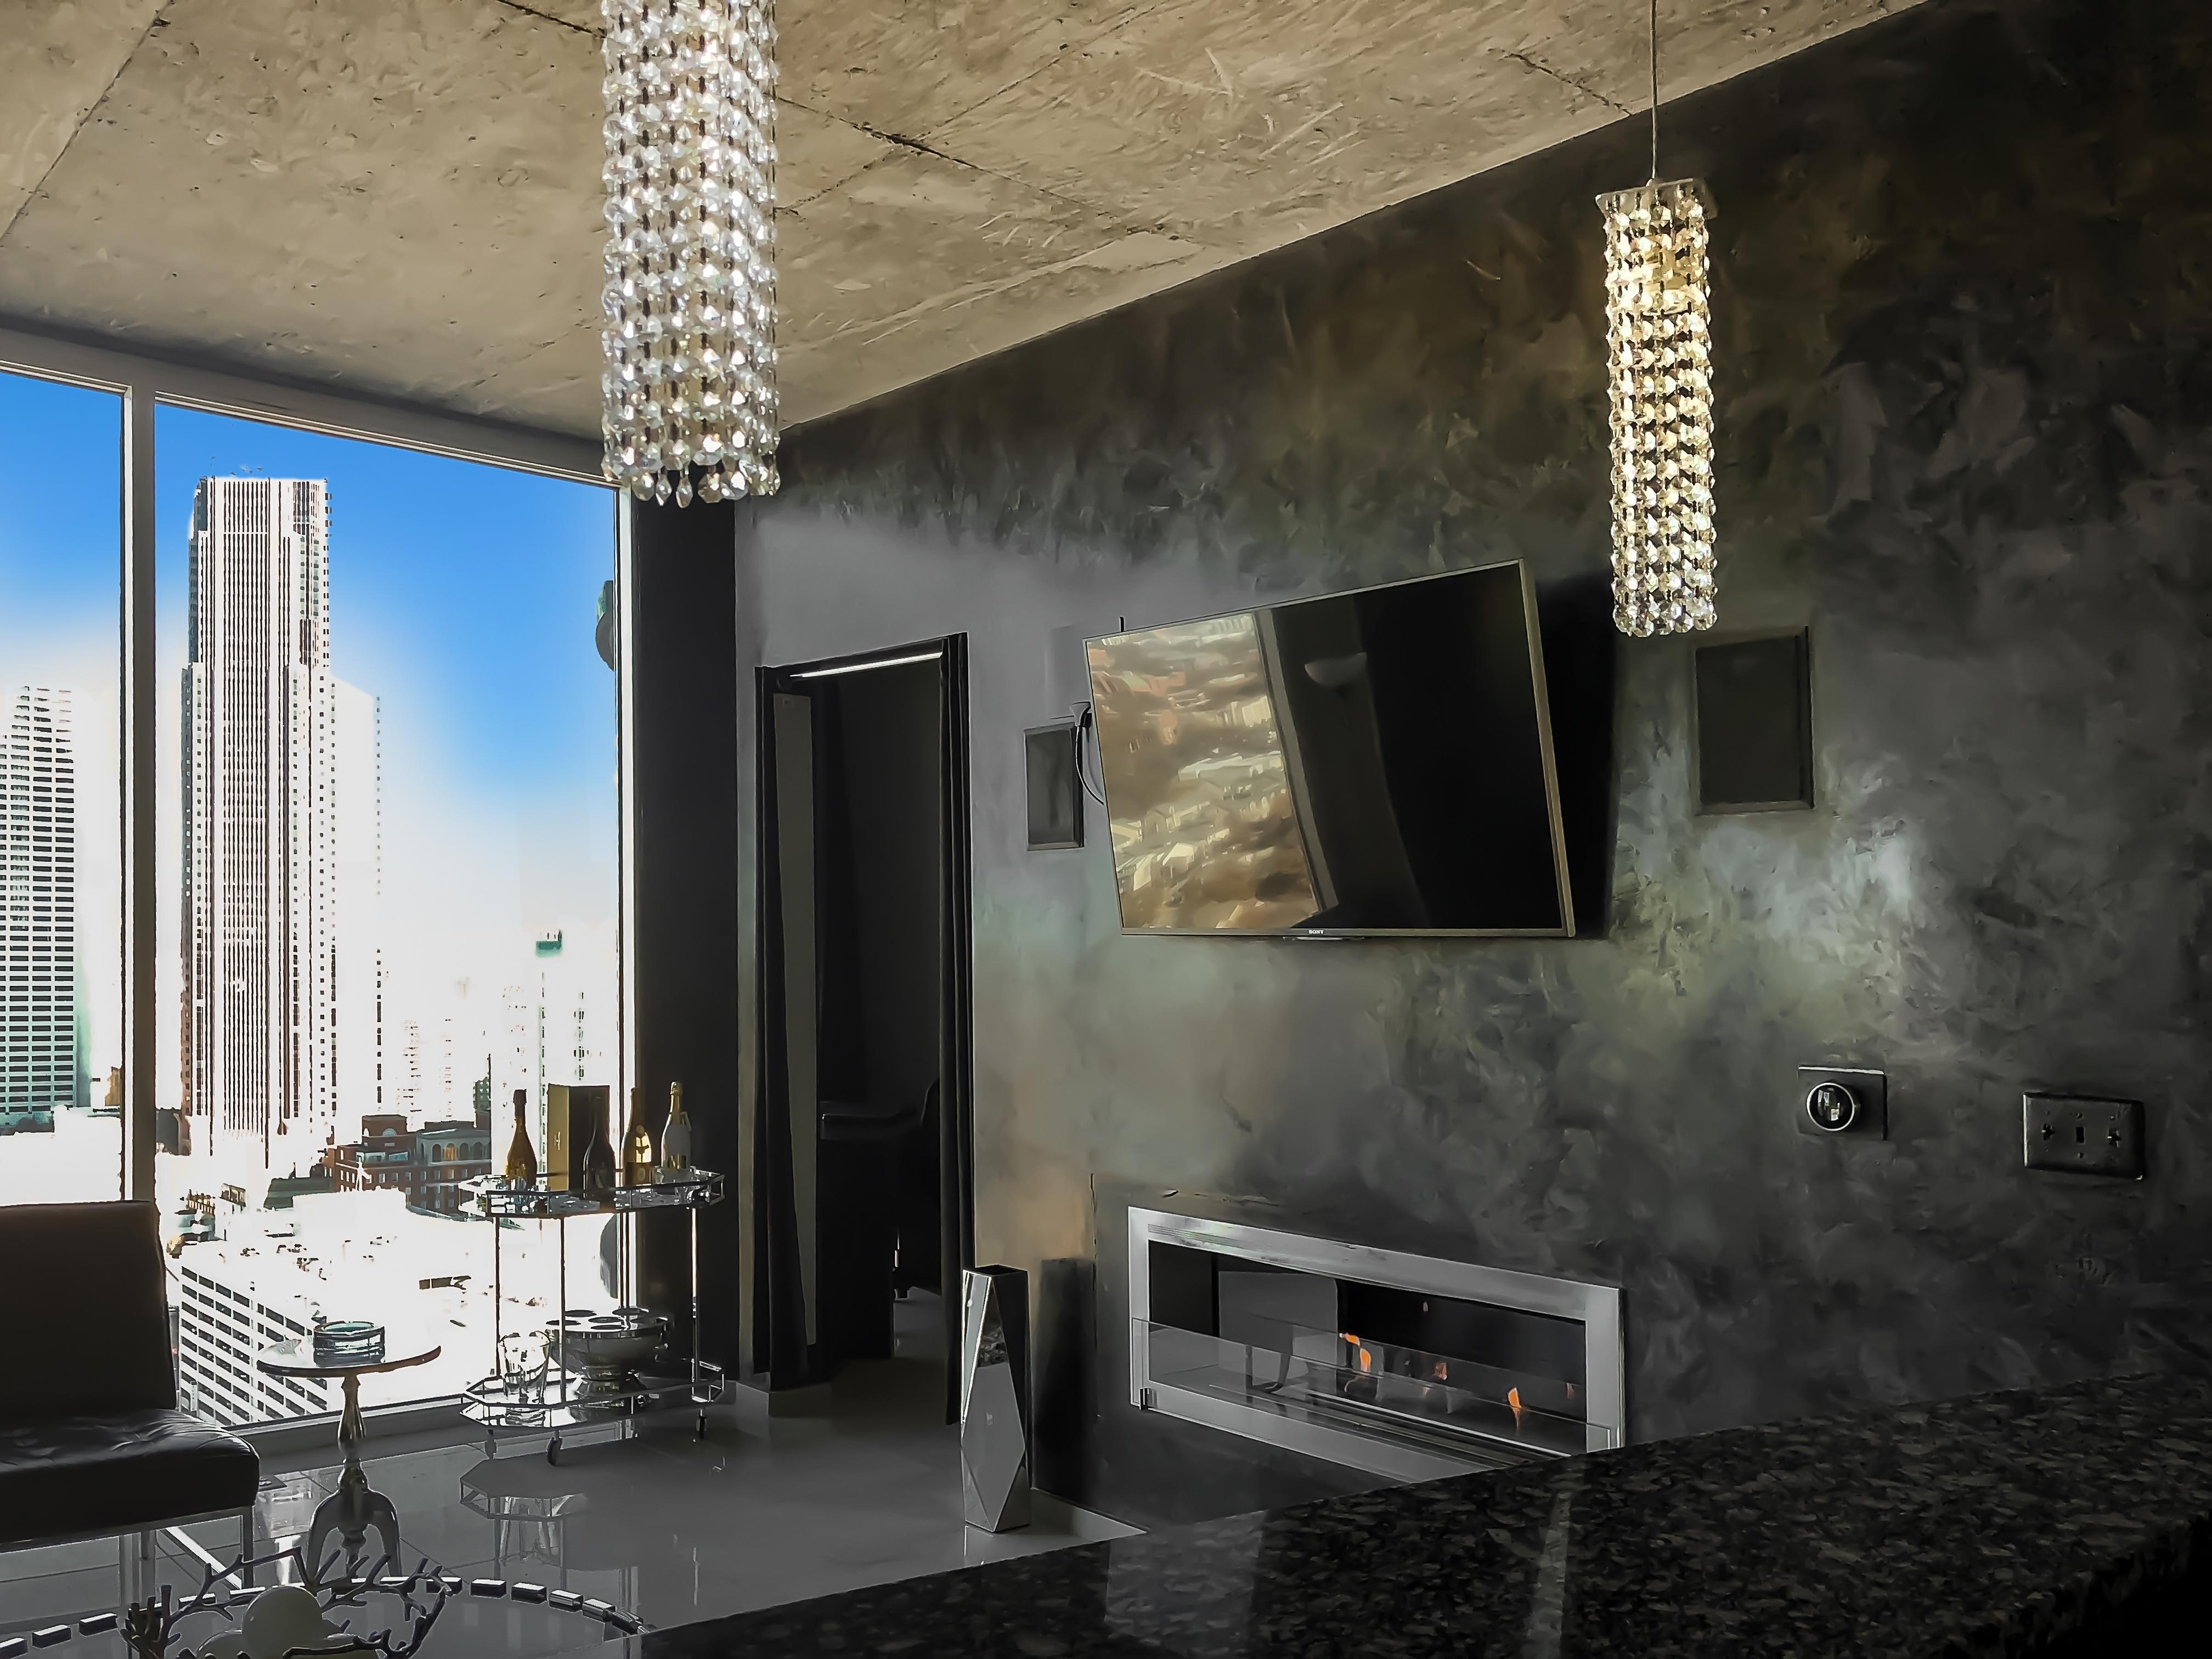 Luxury Condo With SkyLine Views For Productions Use, Atlanta, GA |  Production | Peerspace